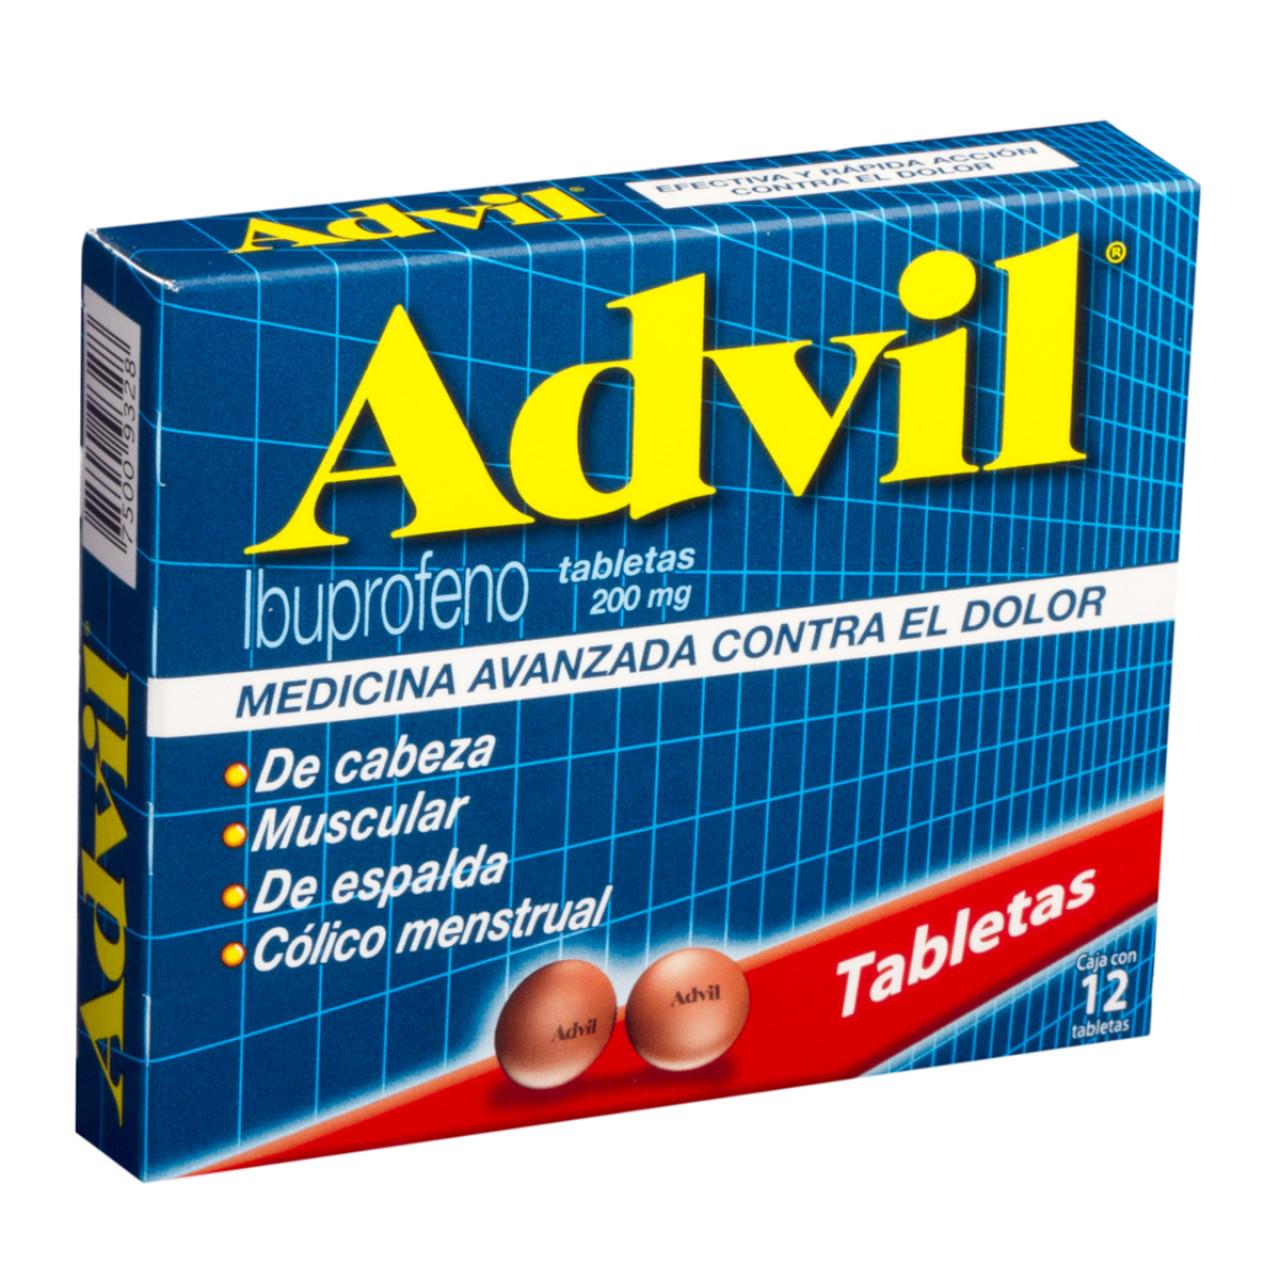 Advil max para que es